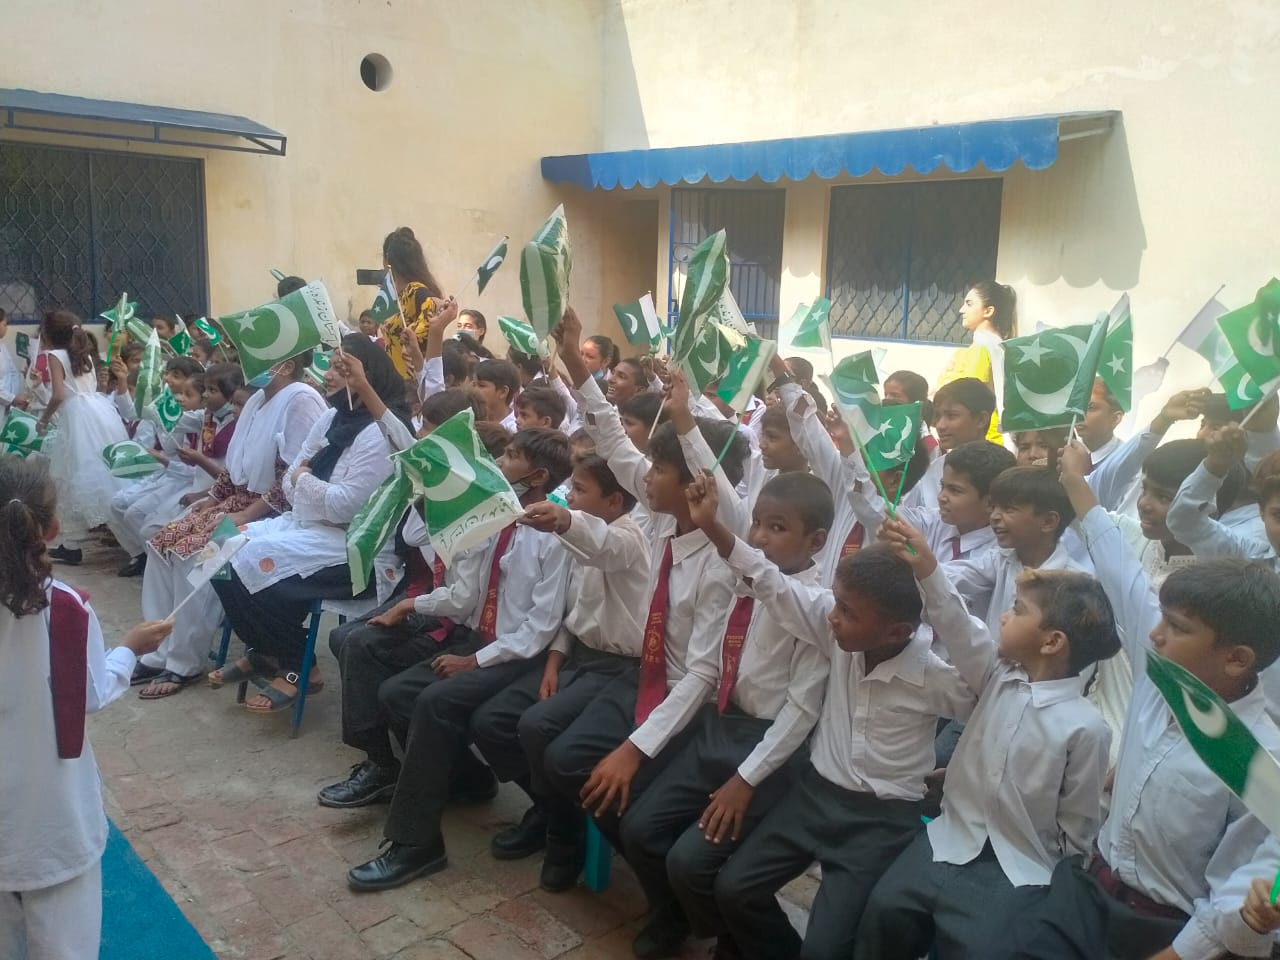 Students seated, each raising the pakistan flag